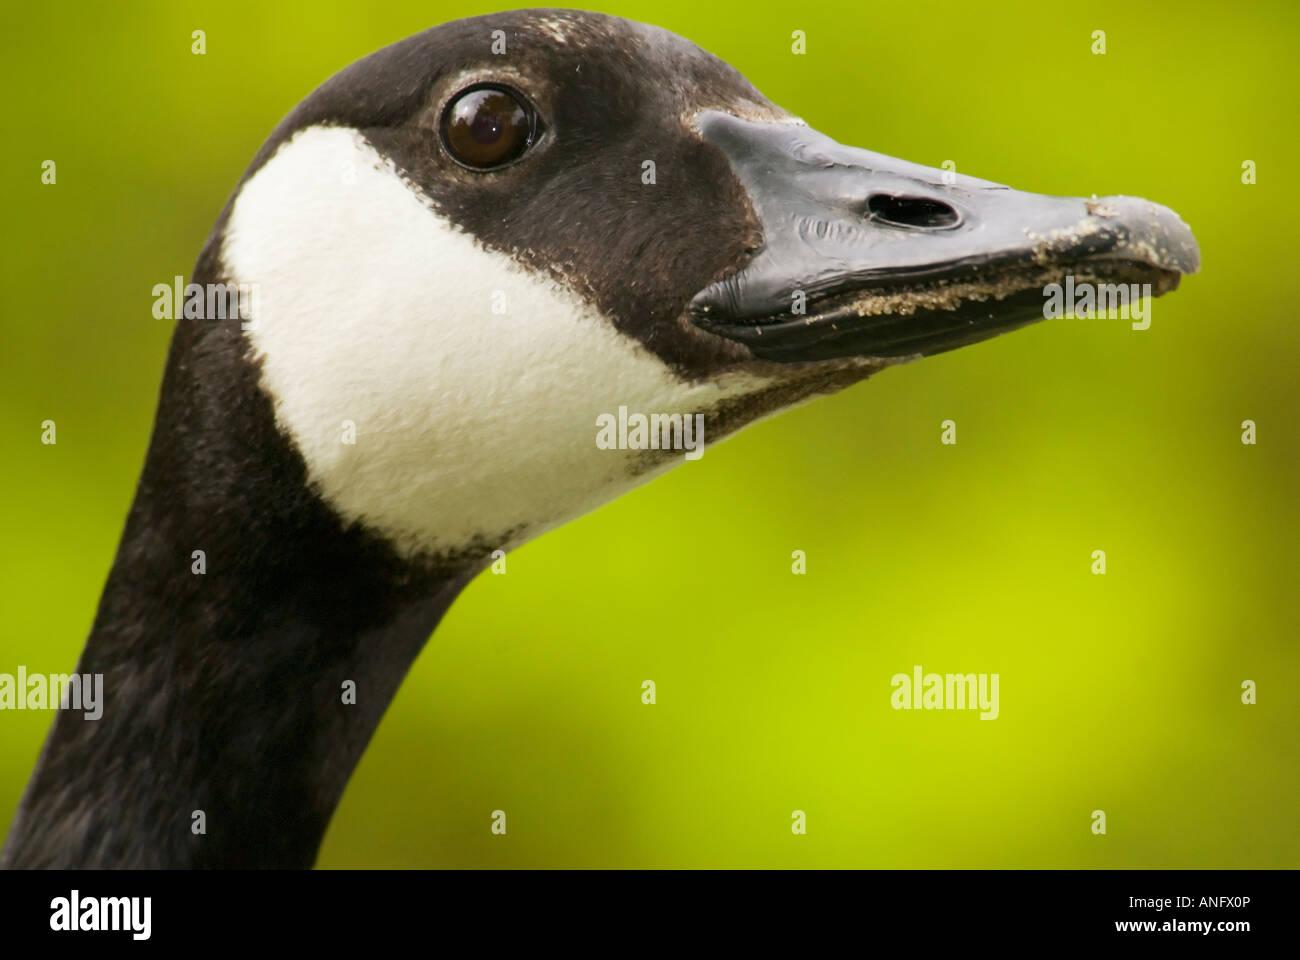 Adult canada goose a canadian symbol ontario canada stock photo adult canada goose a canadian symbol ontario canada biocorpaavc